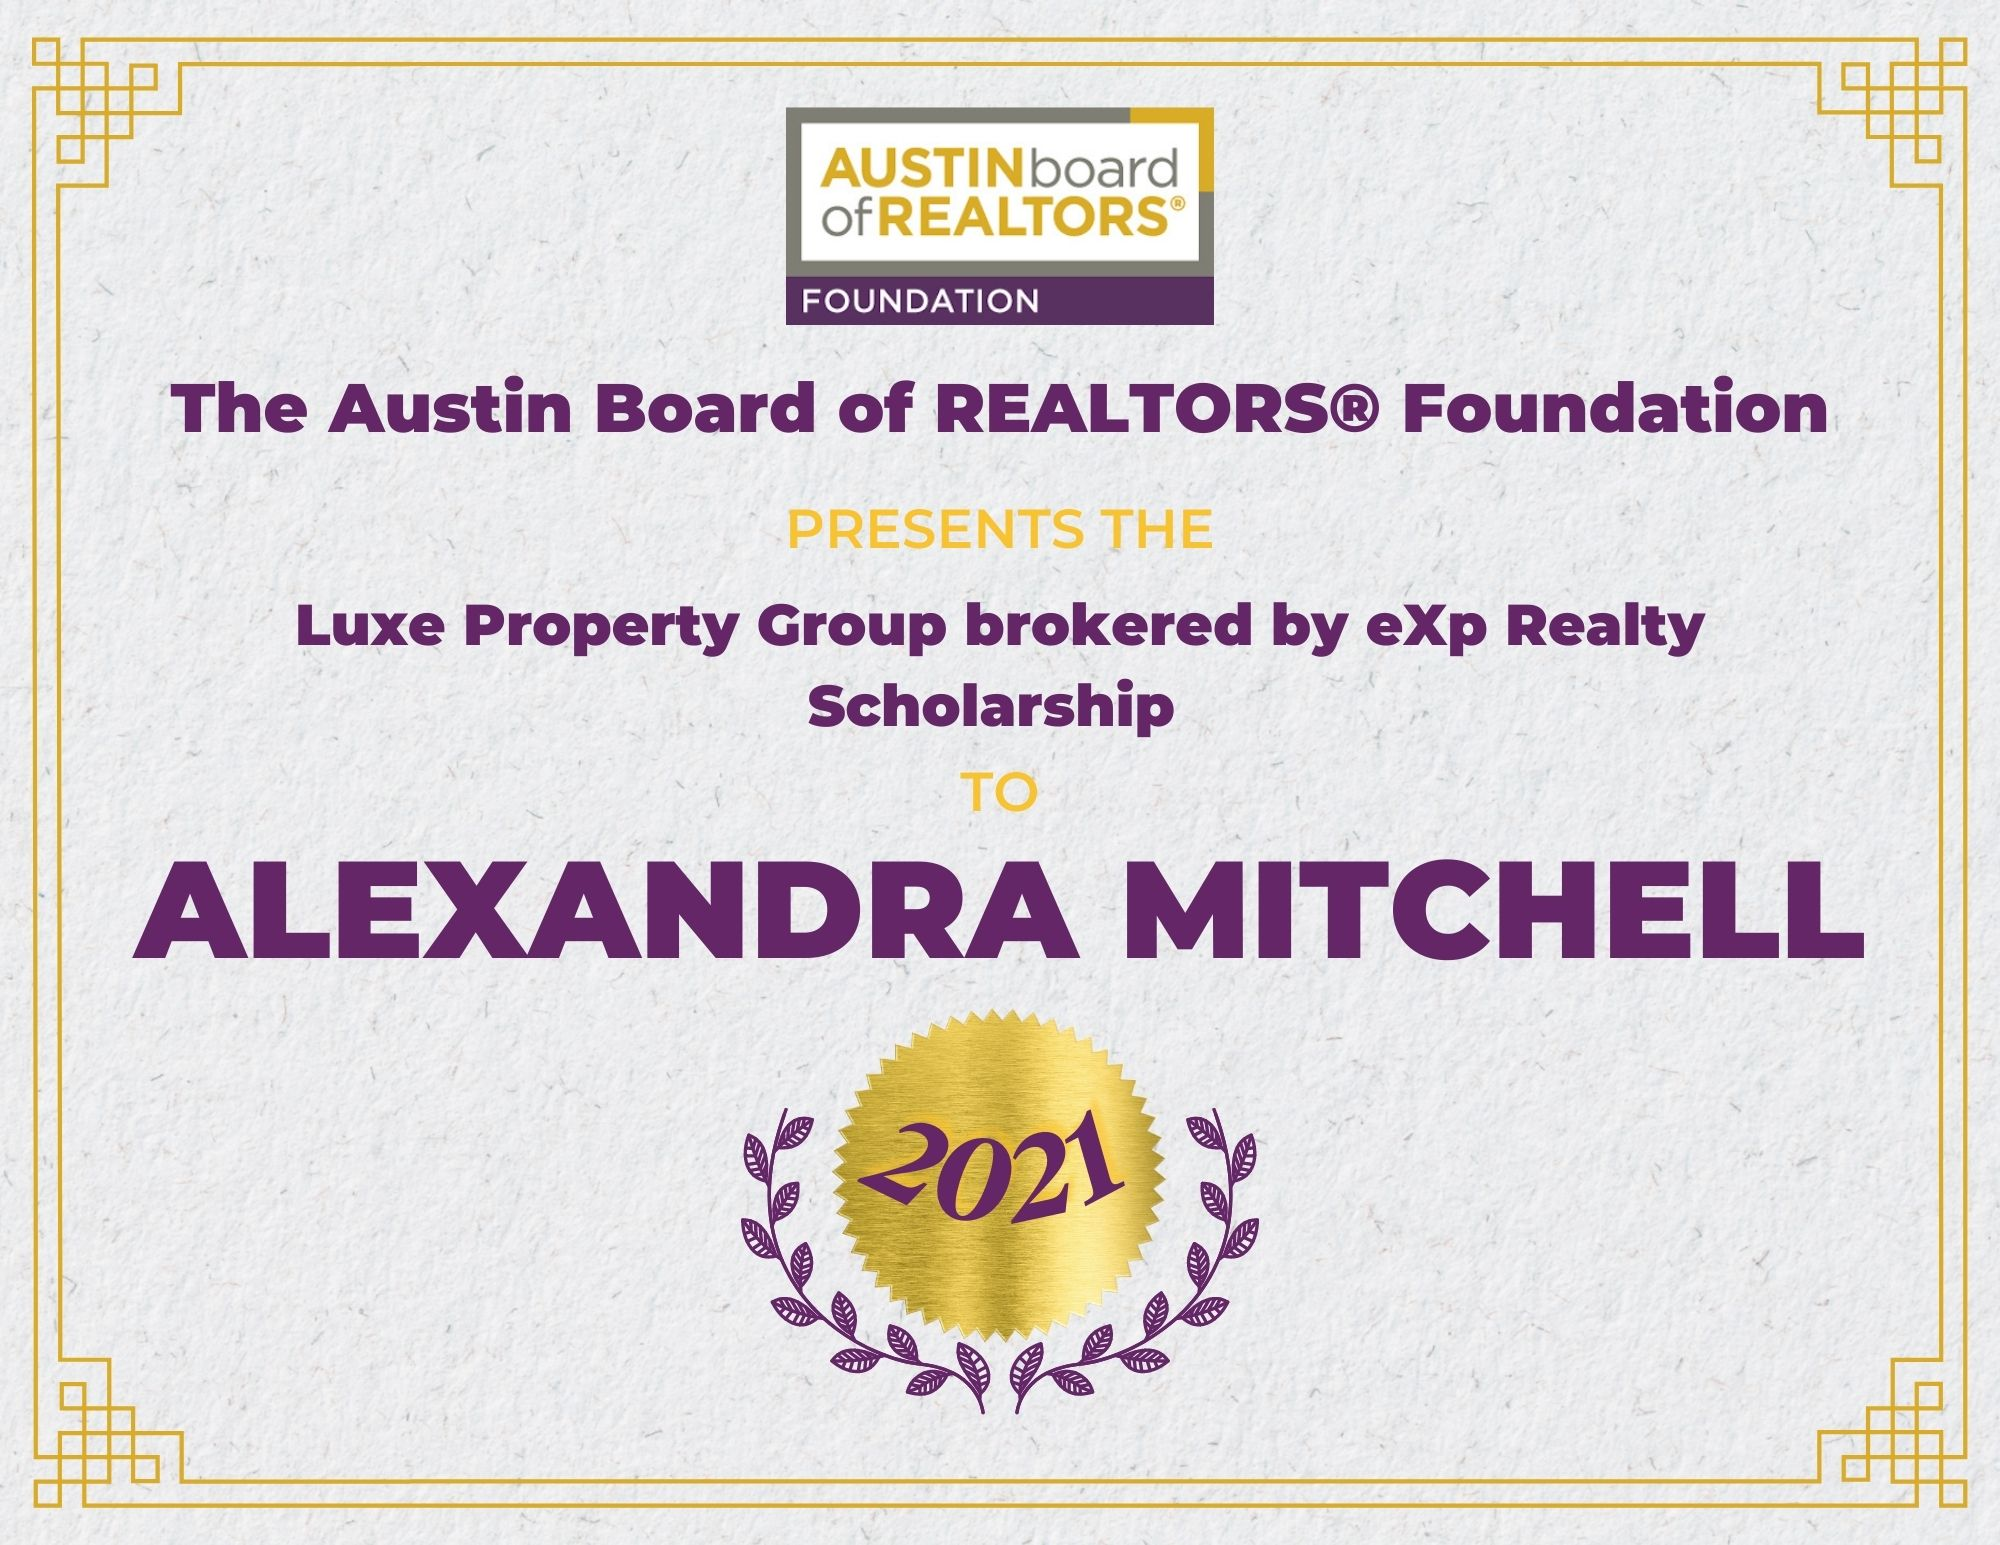 2021 Fou Scholarship Certificate Alexandramitchell